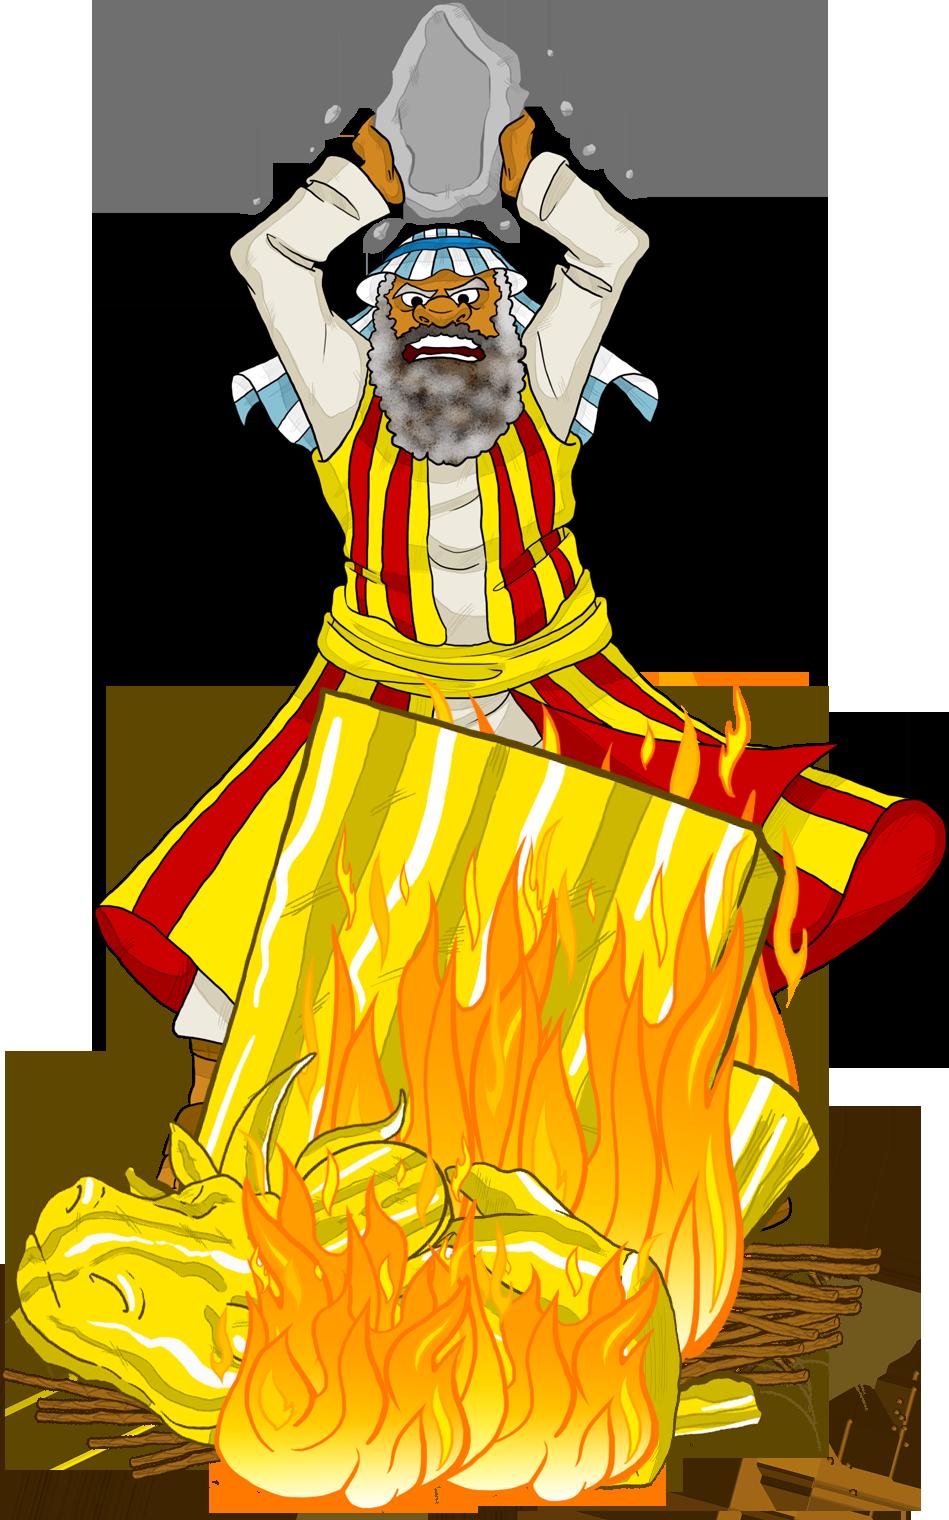 Burnt down house clipart banner Moses destroys the golden calf. | Children ministry | Pinterest ... banner